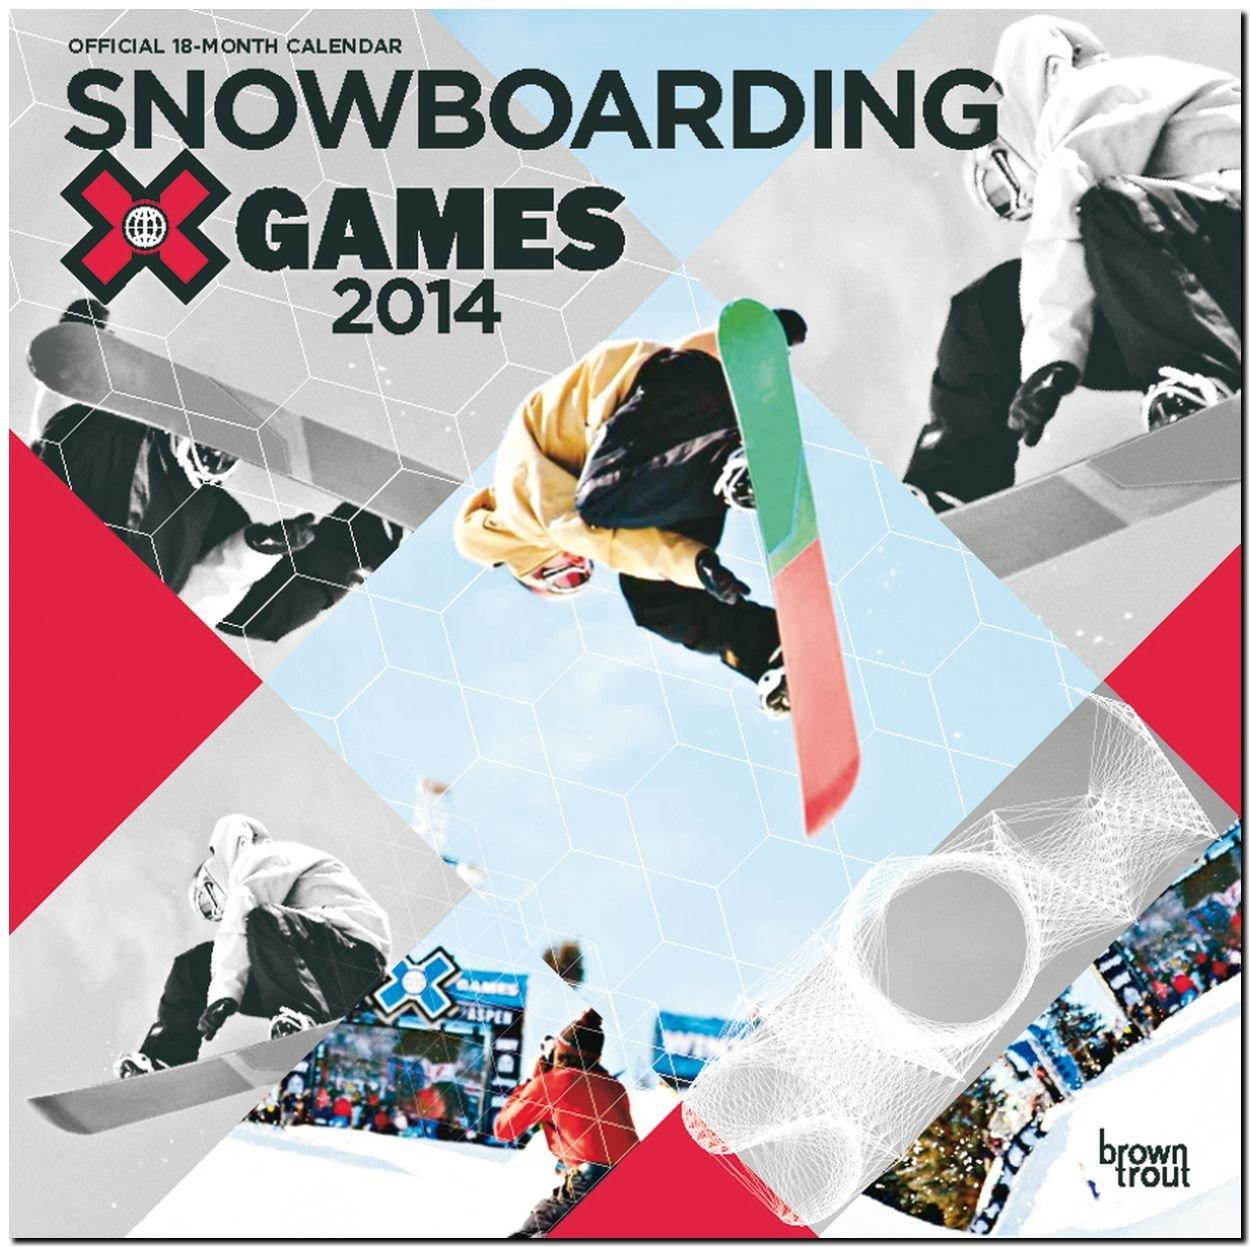 Snowboarding 2014 - Snowboarden: Original BrownTrout-Kalender [Mehrsprachig] [Kalender]